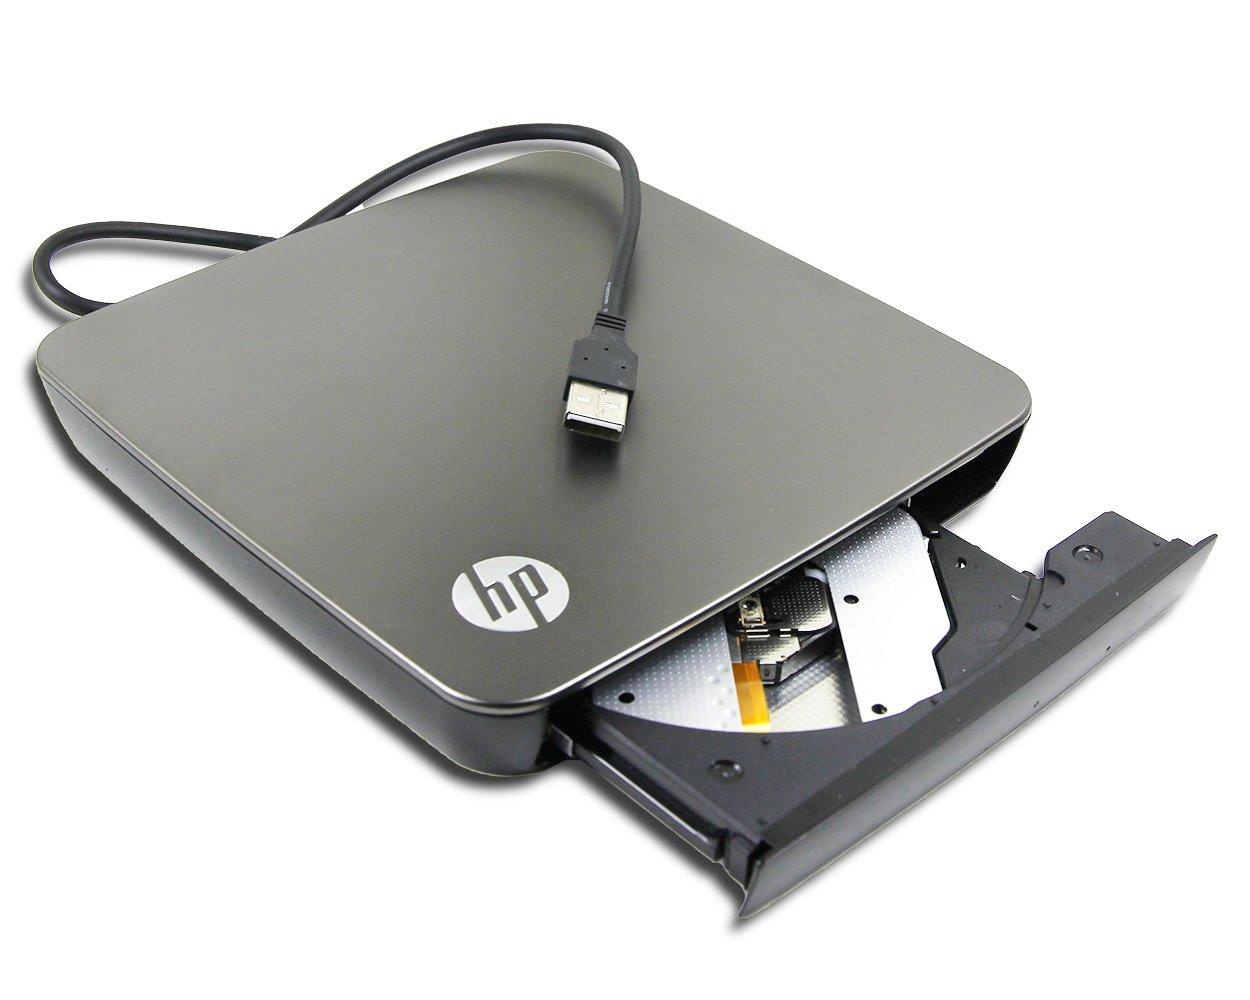 100% Original for HP Pavilion Envy 13 14 15 15t 15z X2 ProBook Laptop External USB 2.0 LightSrcibe Dual Layer 8X DVD+-RW DL DVD-RAM Burner 24X CD-RW Writer Portable Optical Drive